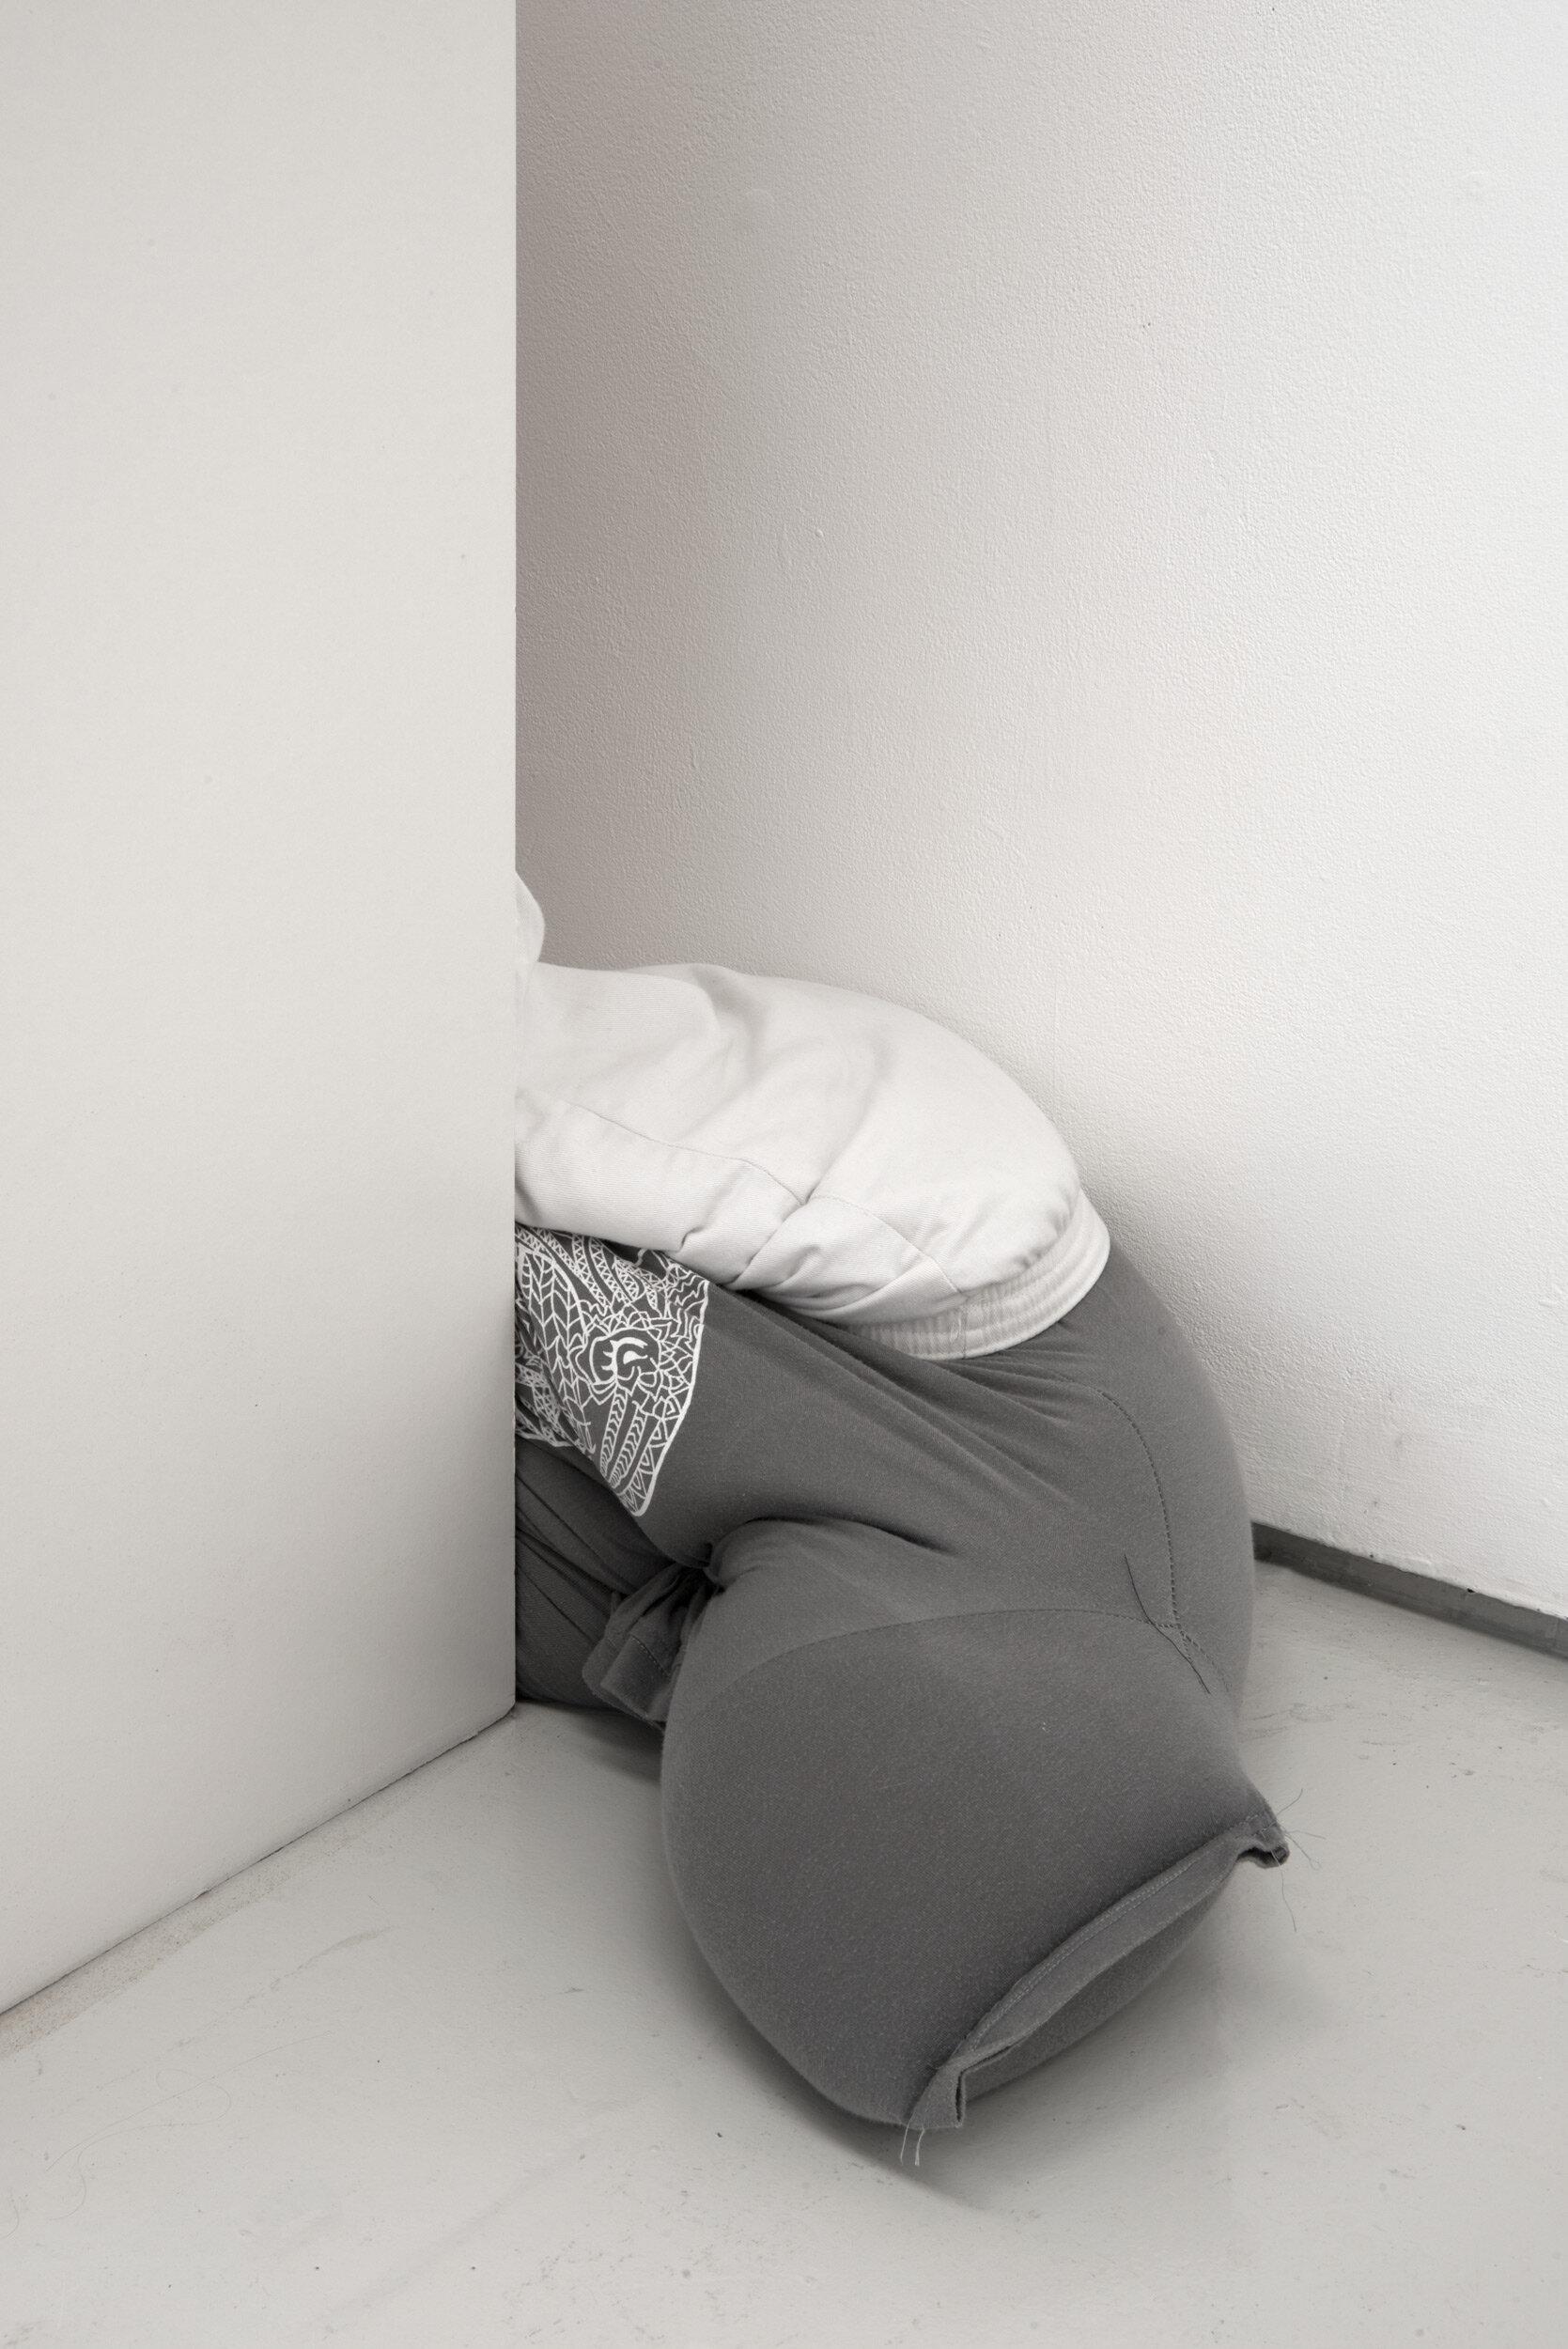 Collapse, slide, bottom-out beside low on a bookshelf, Alex Farrar, Bloc Projects, 2019, 4.jpg